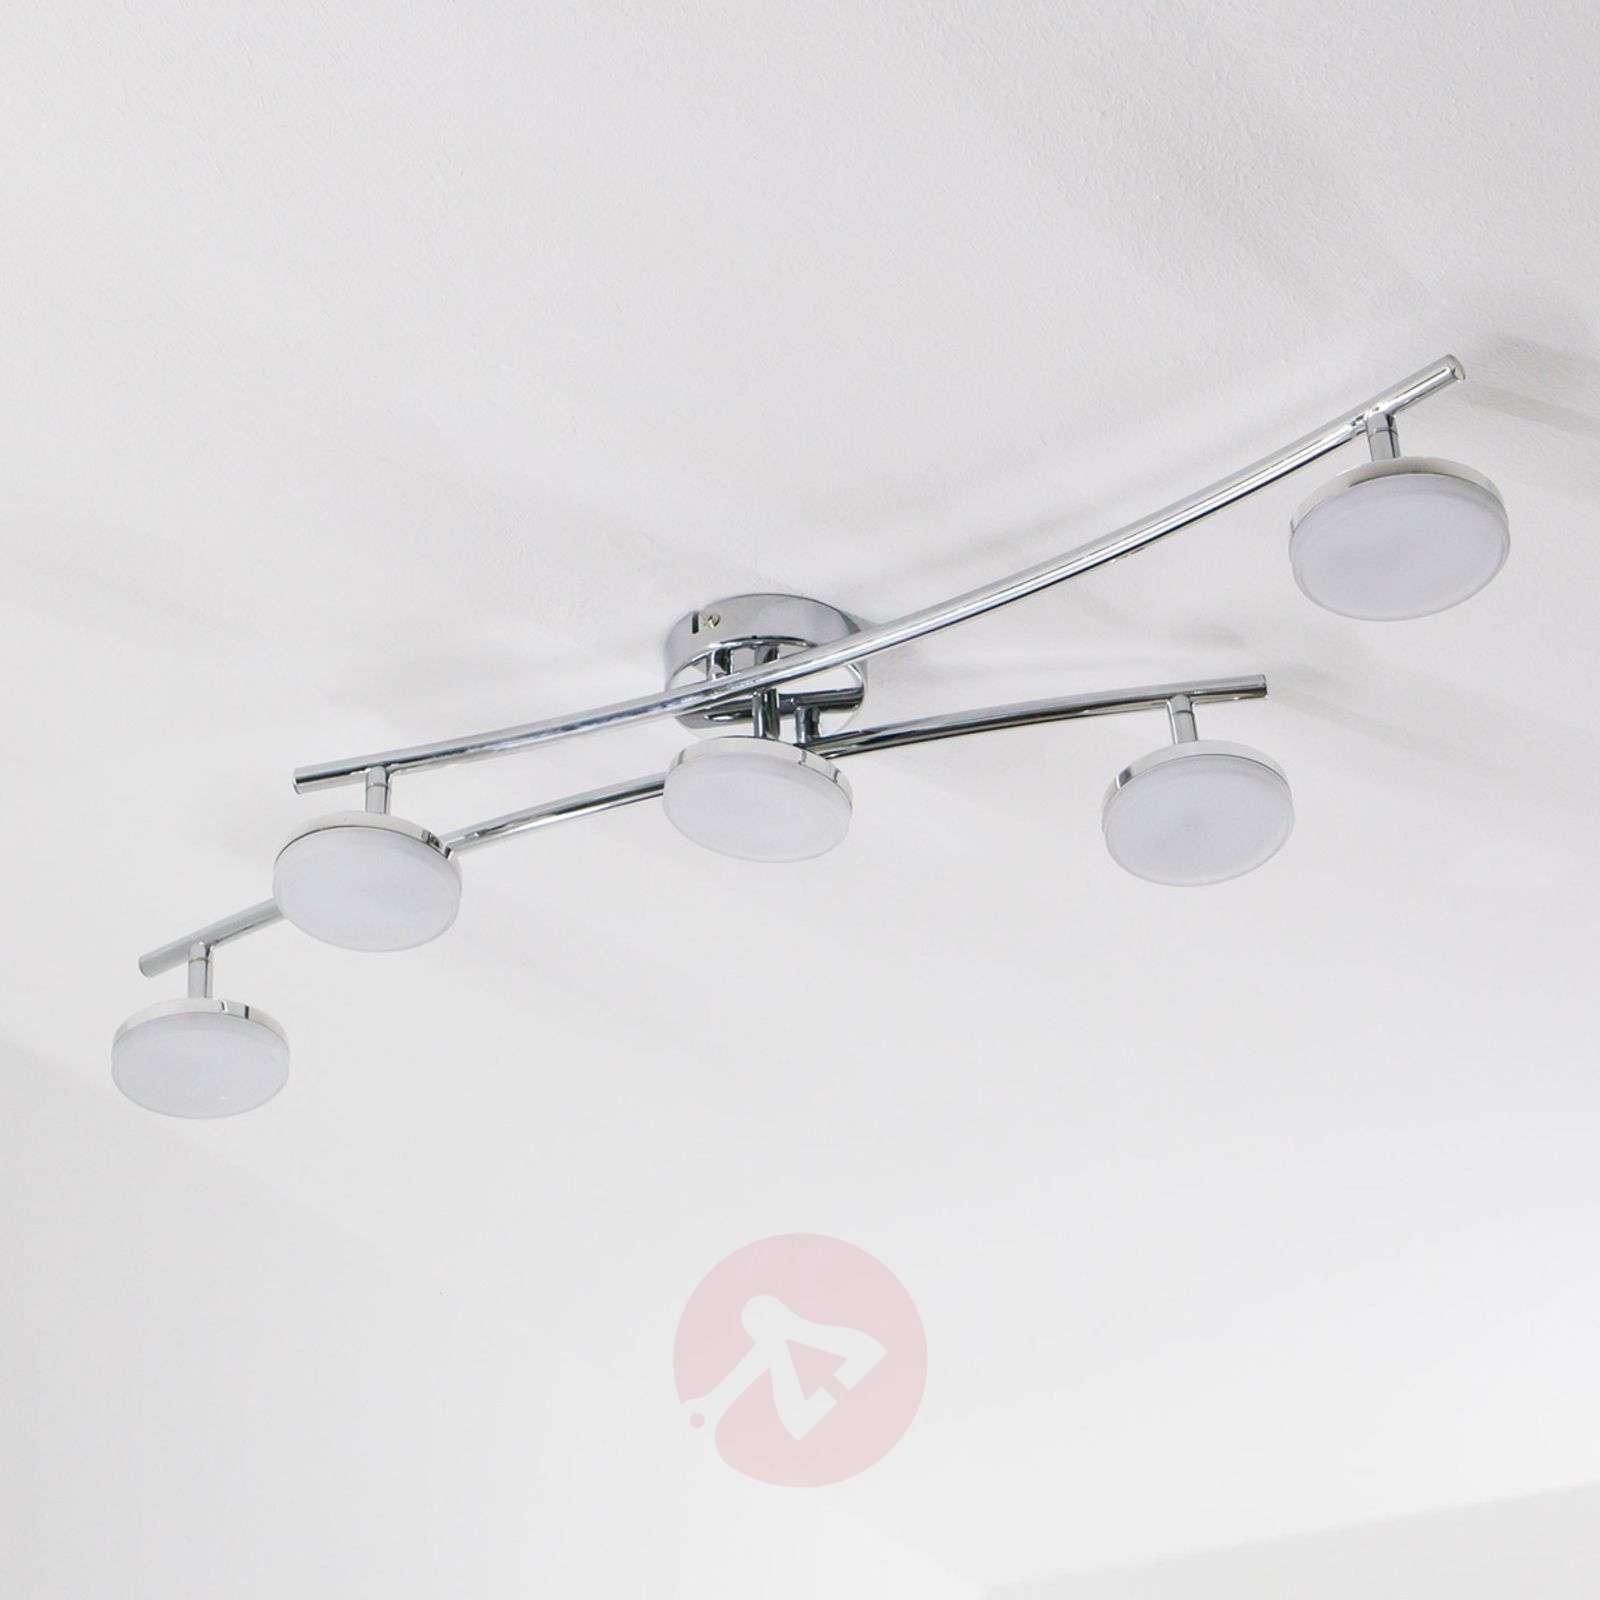 Decorative Lillith LED ceiling light-9981021-06